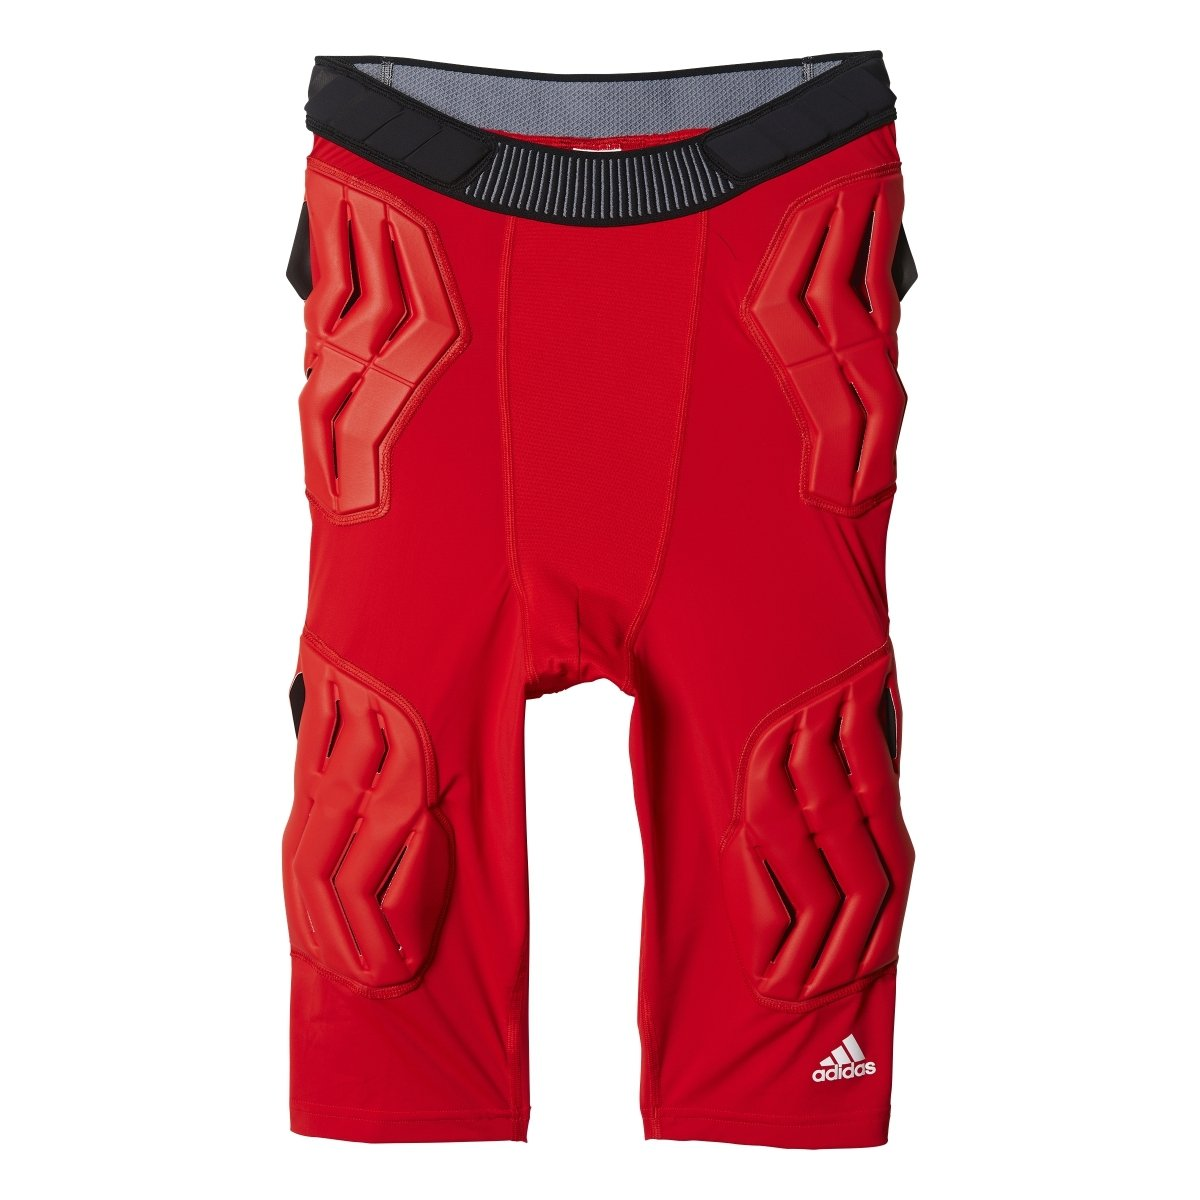 adidas Mens Basketball Padded Techfit Short